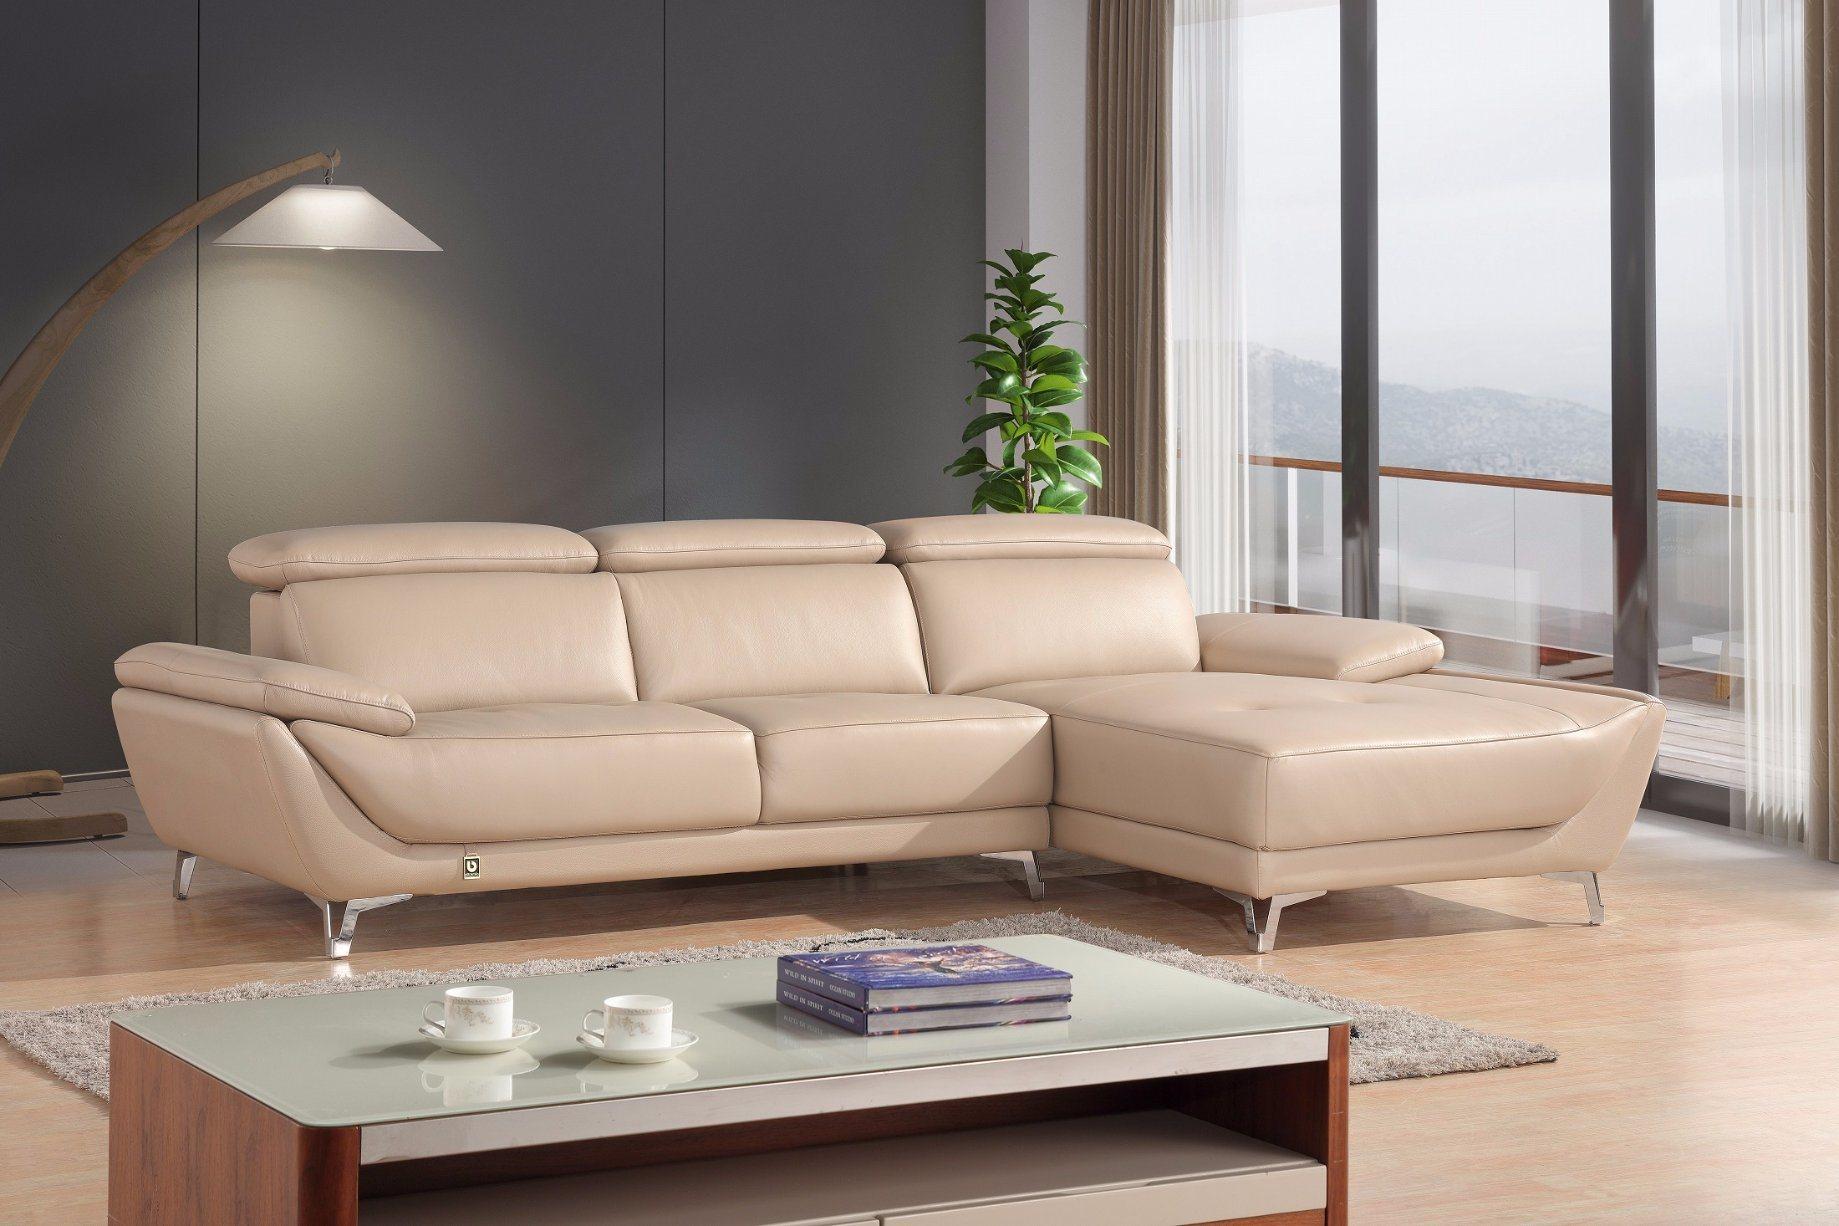 China italian home furniture genuine leather modern 1 2 3 sofa sbl 1716c china sofa leather sofa